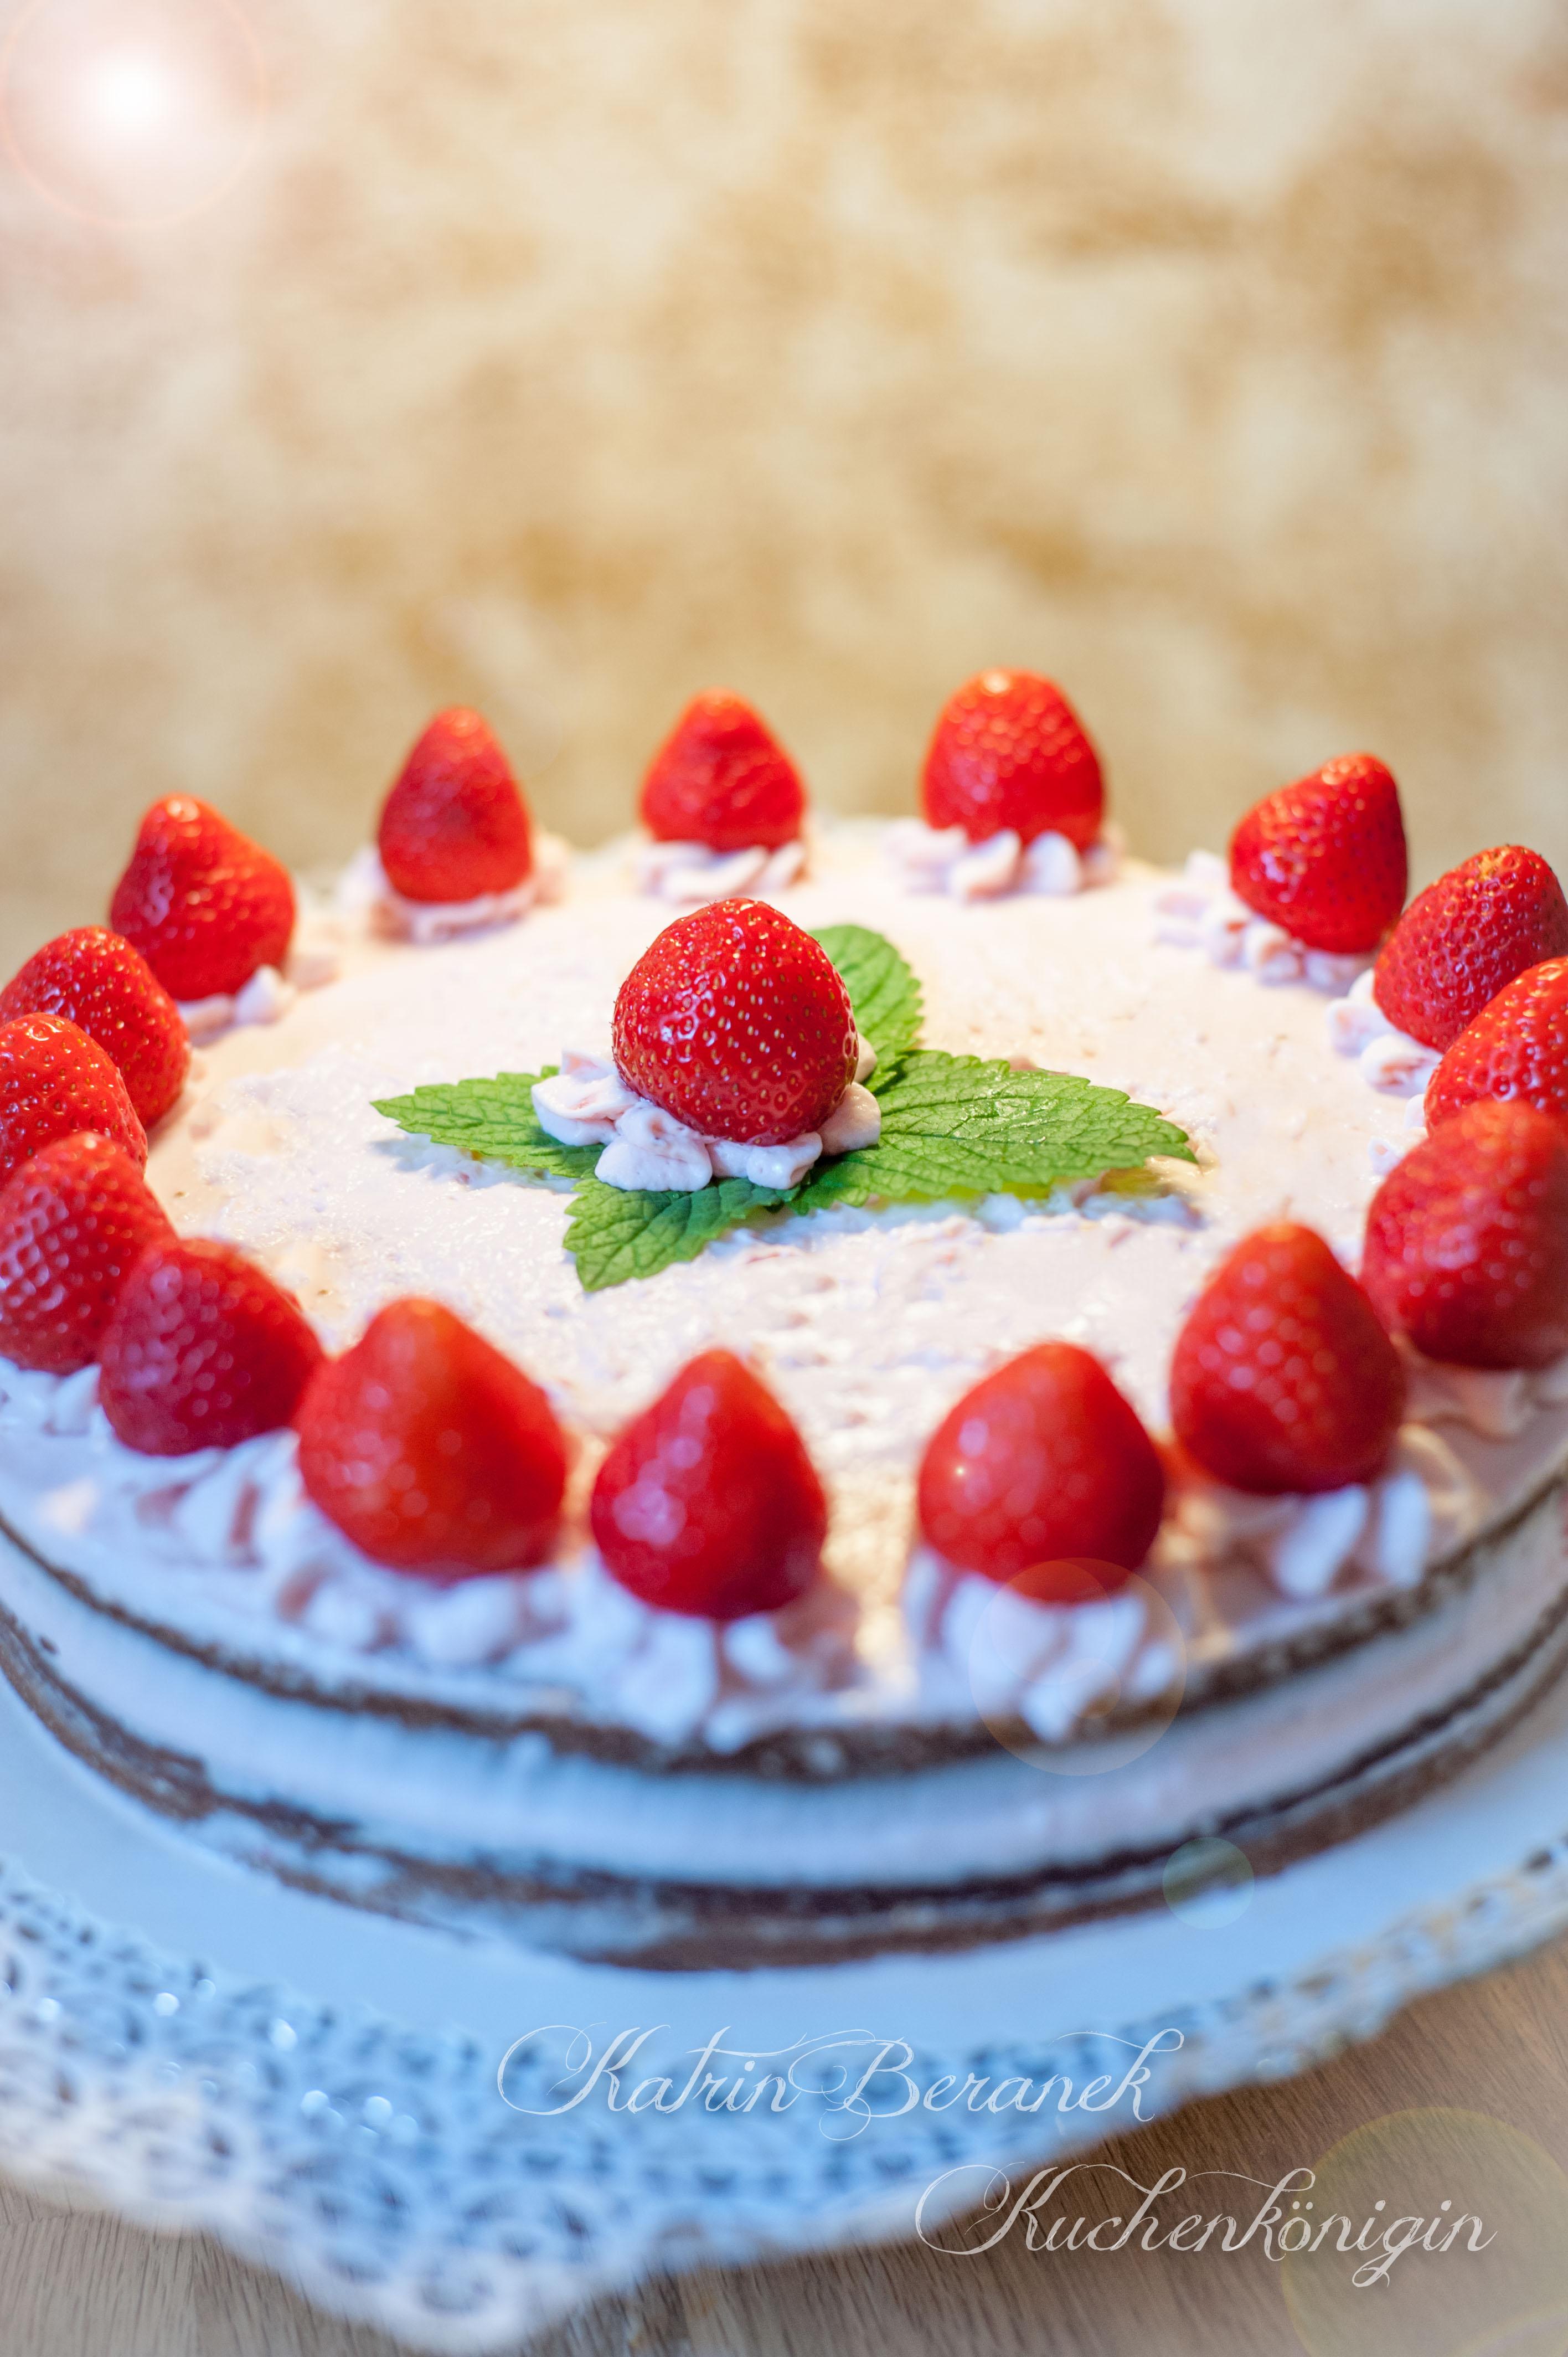 Erdbeer-Mascarpone-Sahne